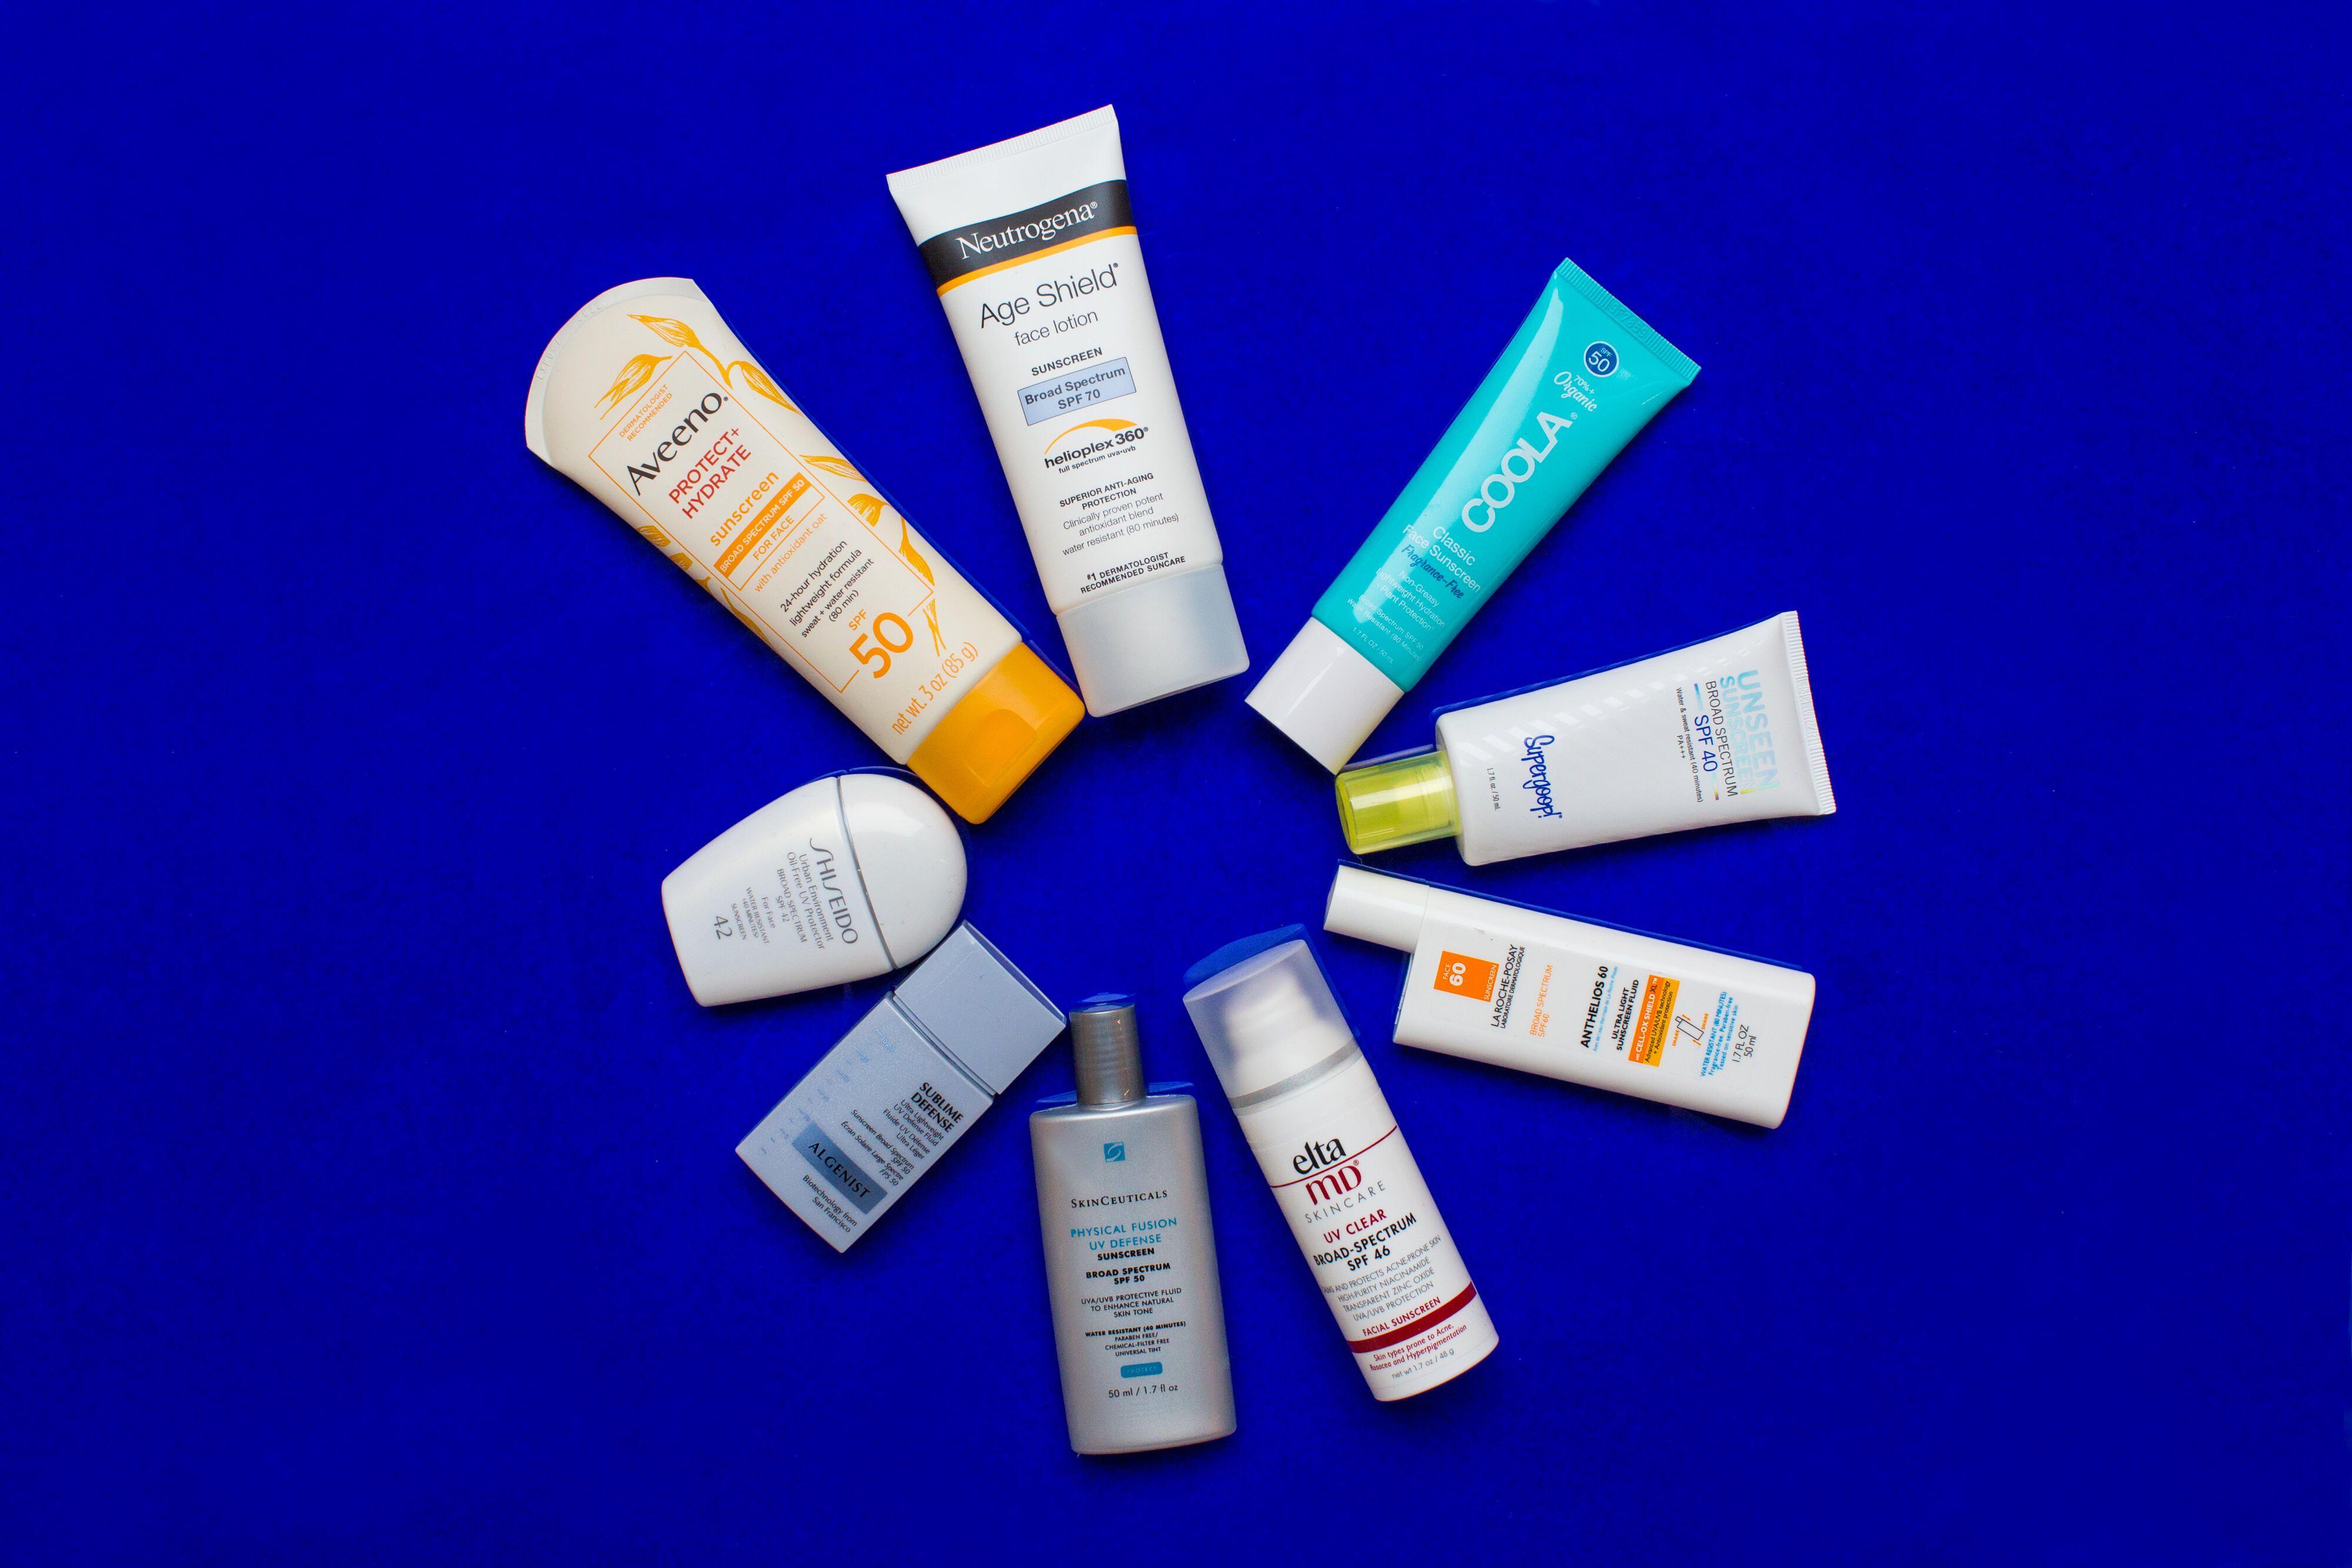 sunscreen-promo-1